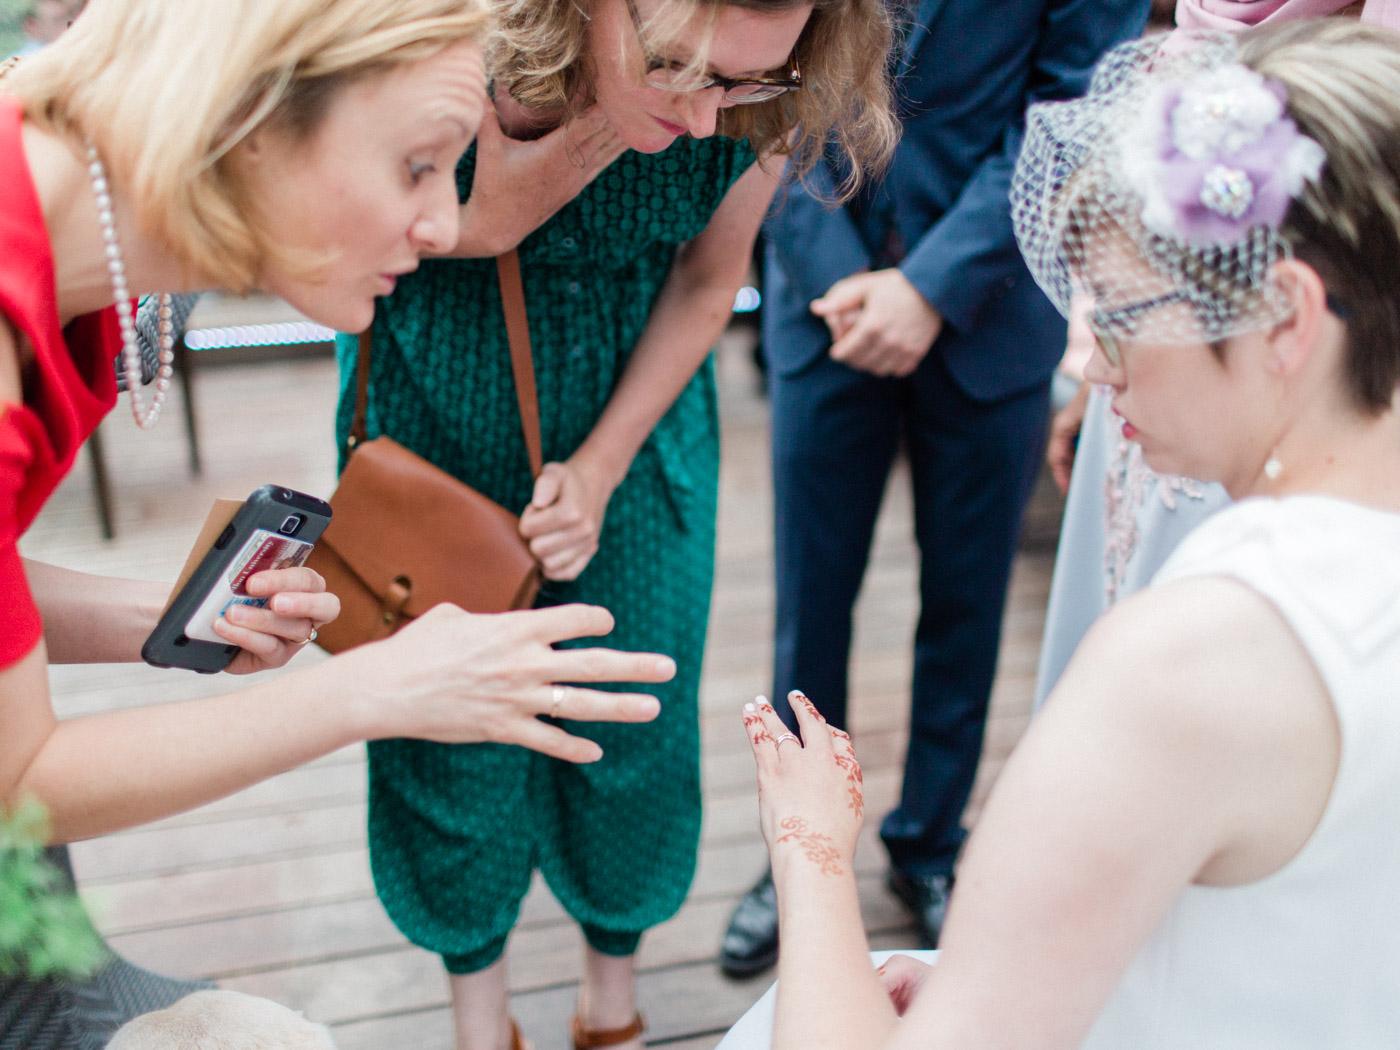 Toronto-wedding-photographer-intimate-restaurant-elopement-chase-oyster-downtown48.jpg